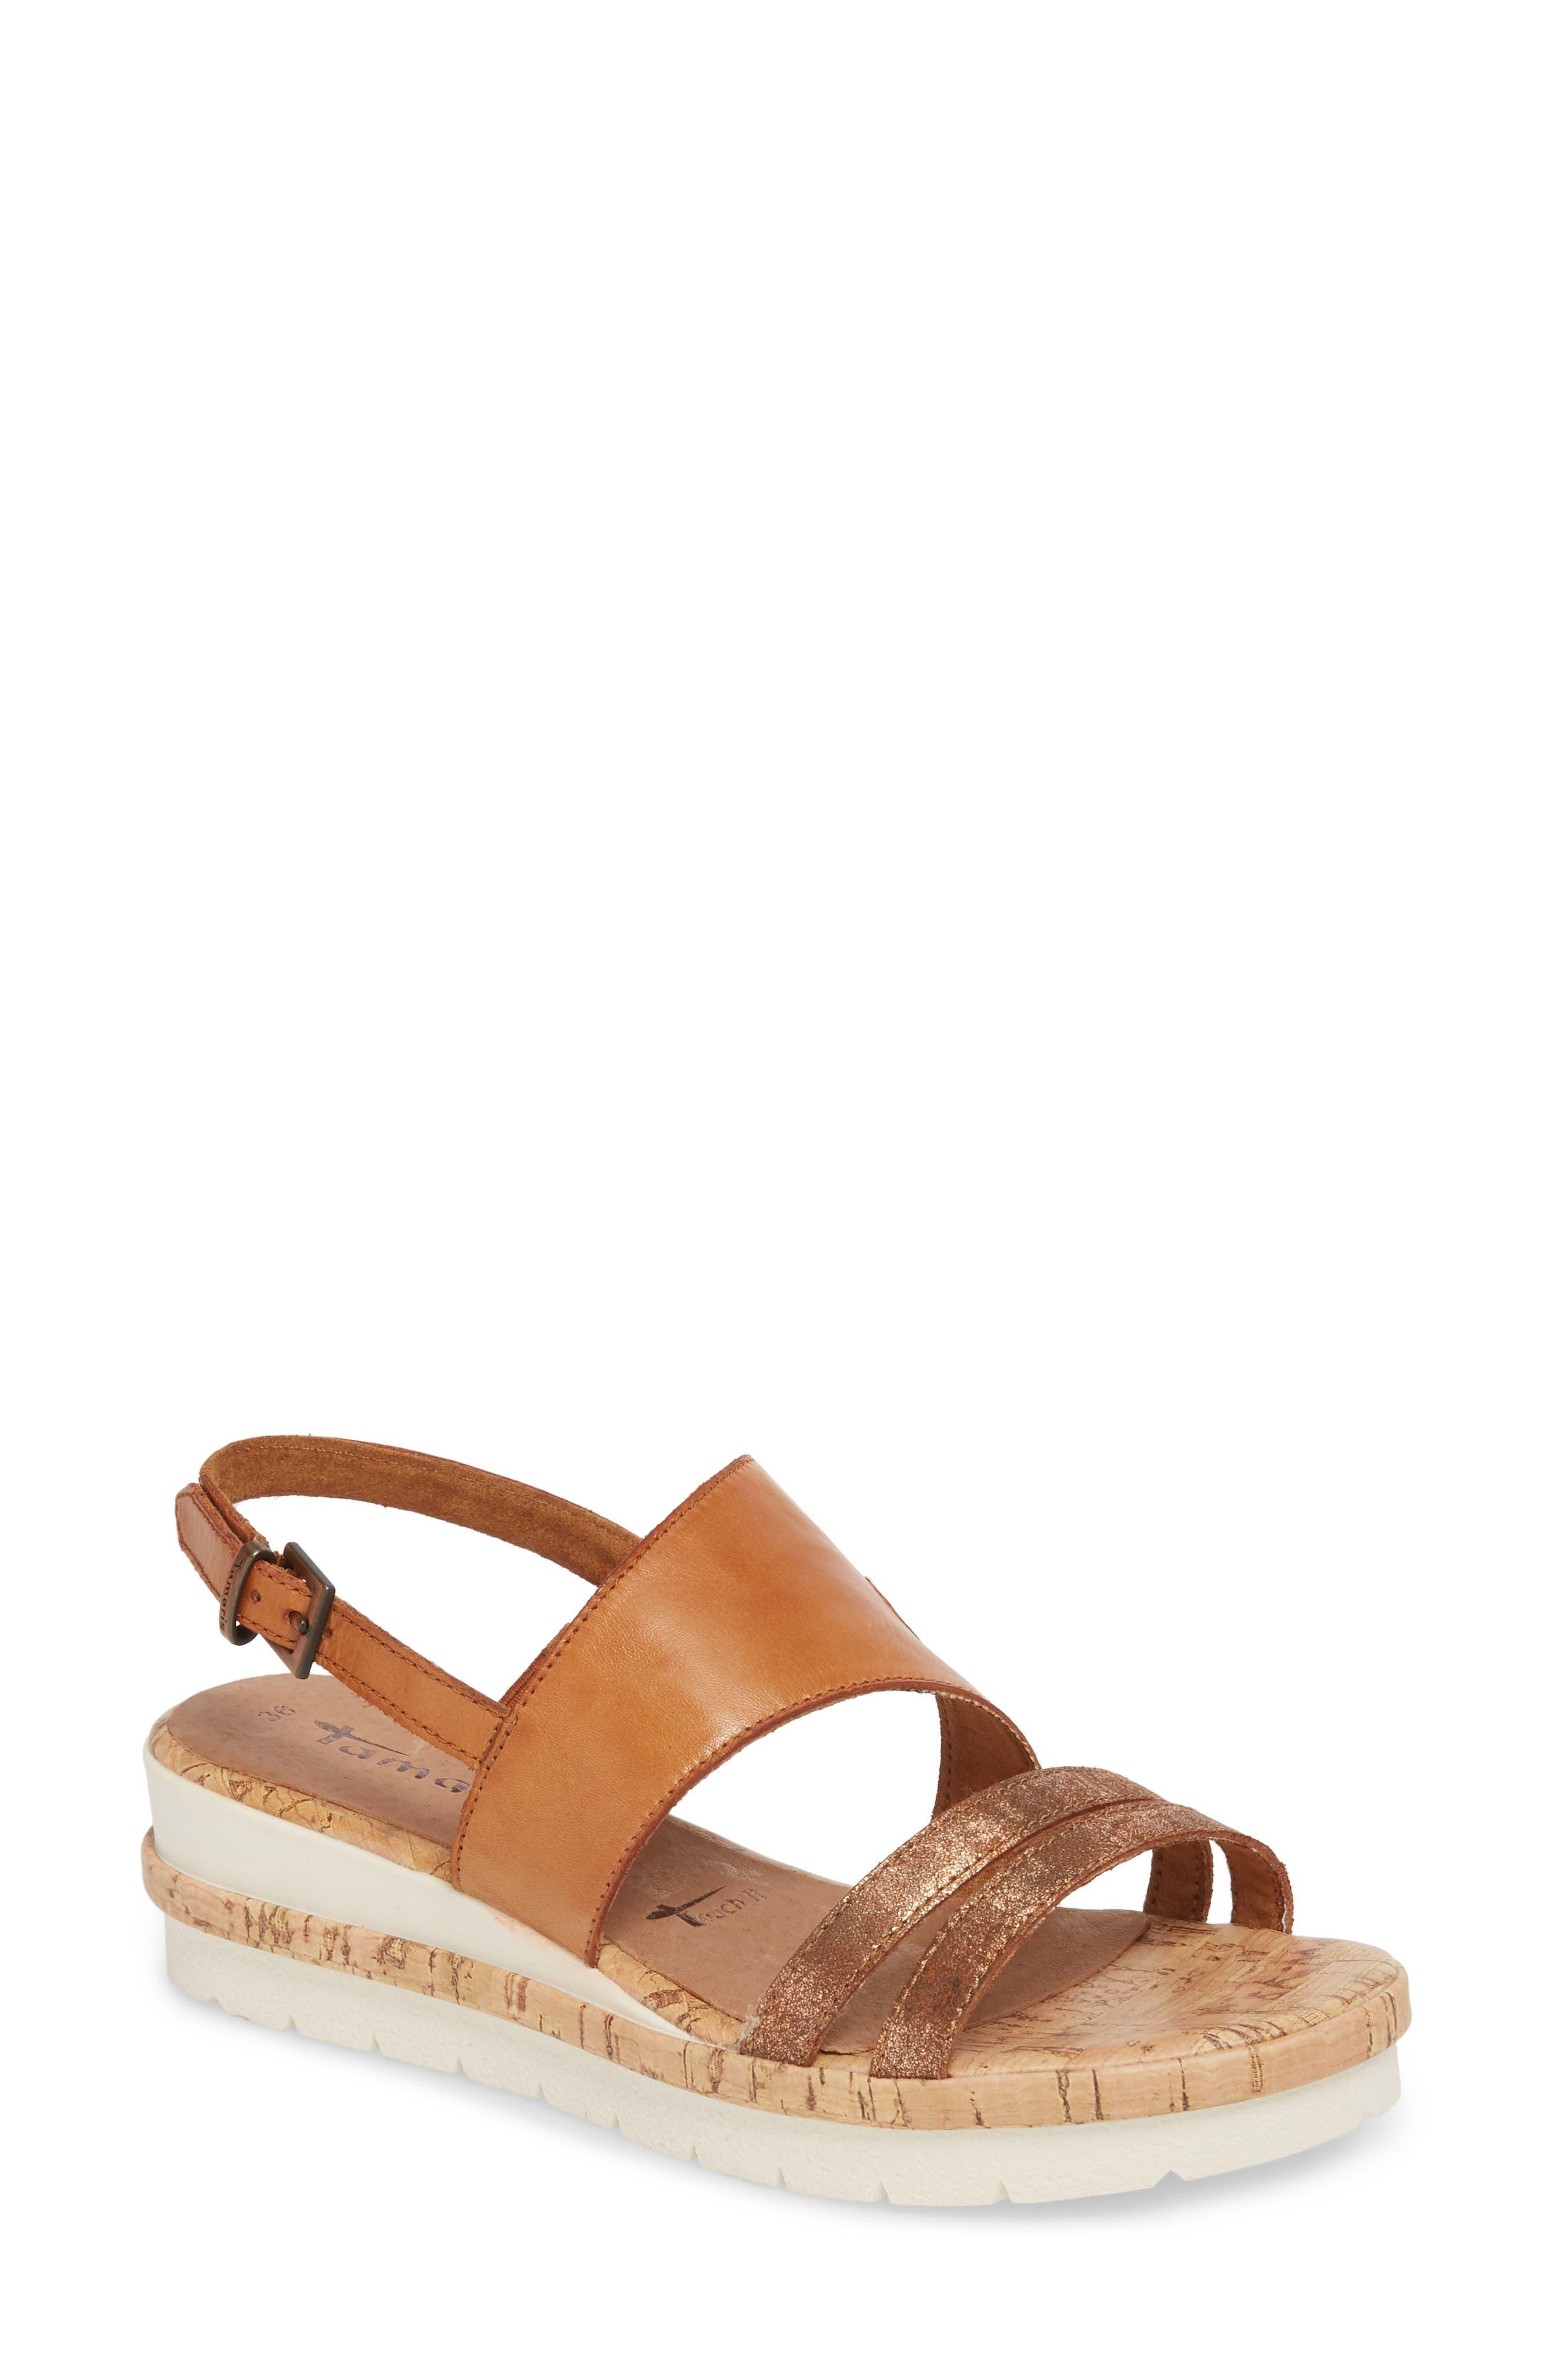 Eda Wedge Sandal,                         Main,                         color, Nut Leather